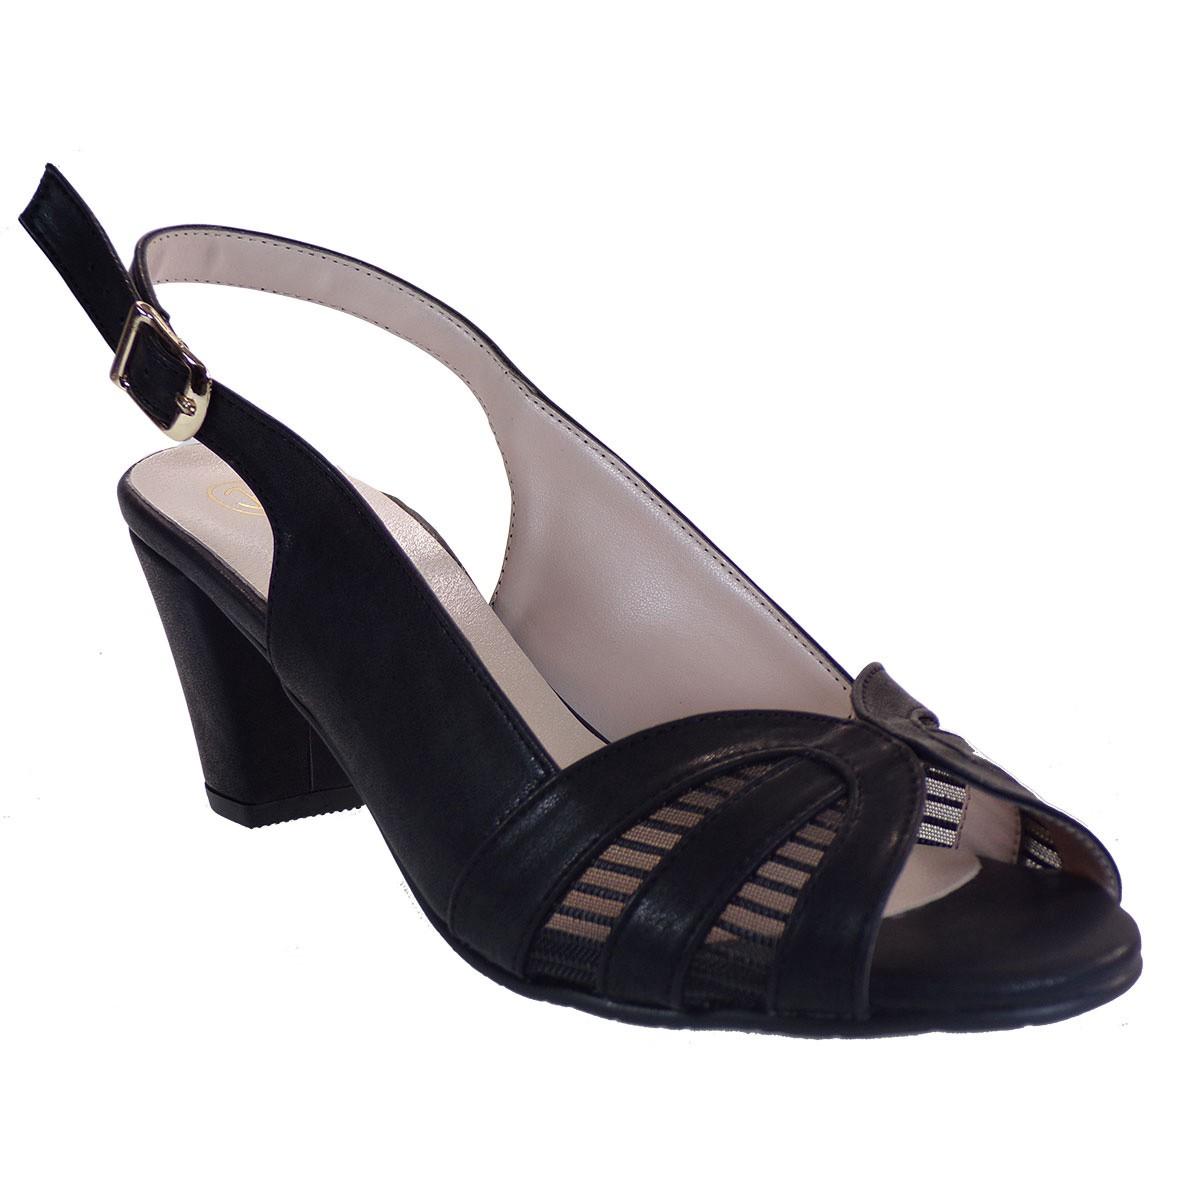 Katia Shoes Γυναικεία Παπούτσια Γόβες Α206-1343 Μαύρο